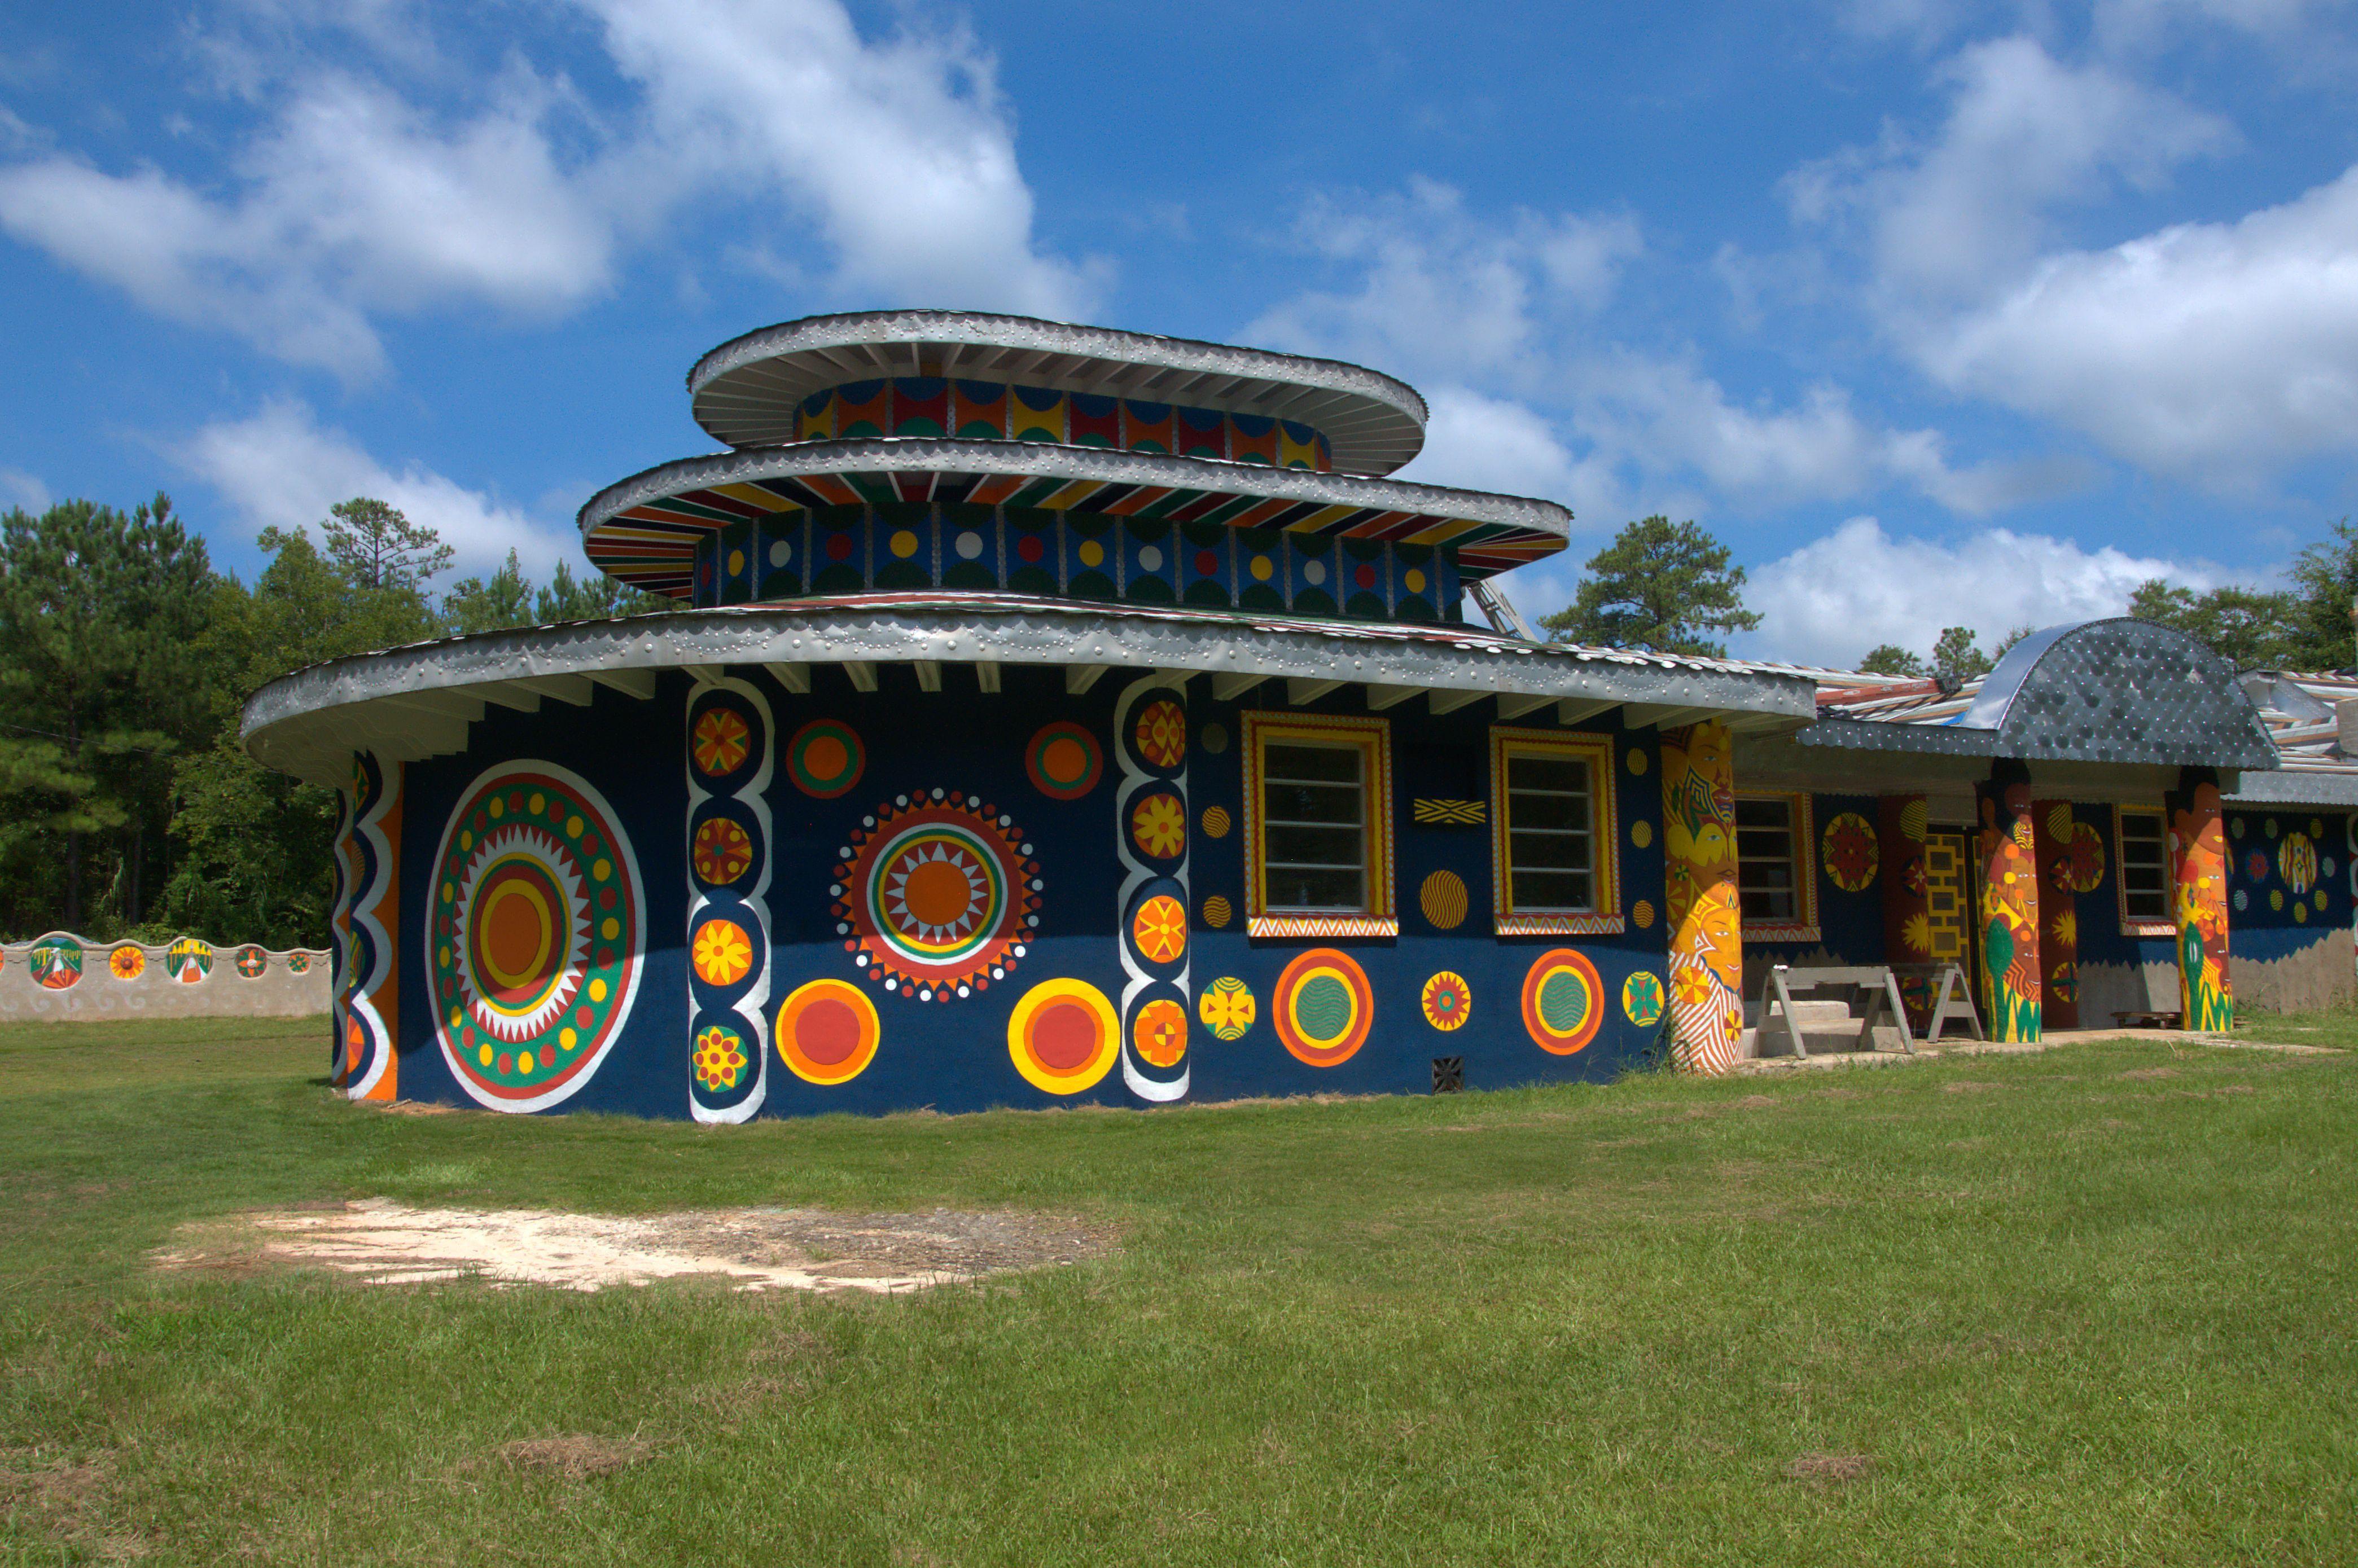 Pasaquan Buena Vista GA Whimsical Architecture St EOM Photograph Copyright Brian Brown Vanishing South Georgia USA 2015